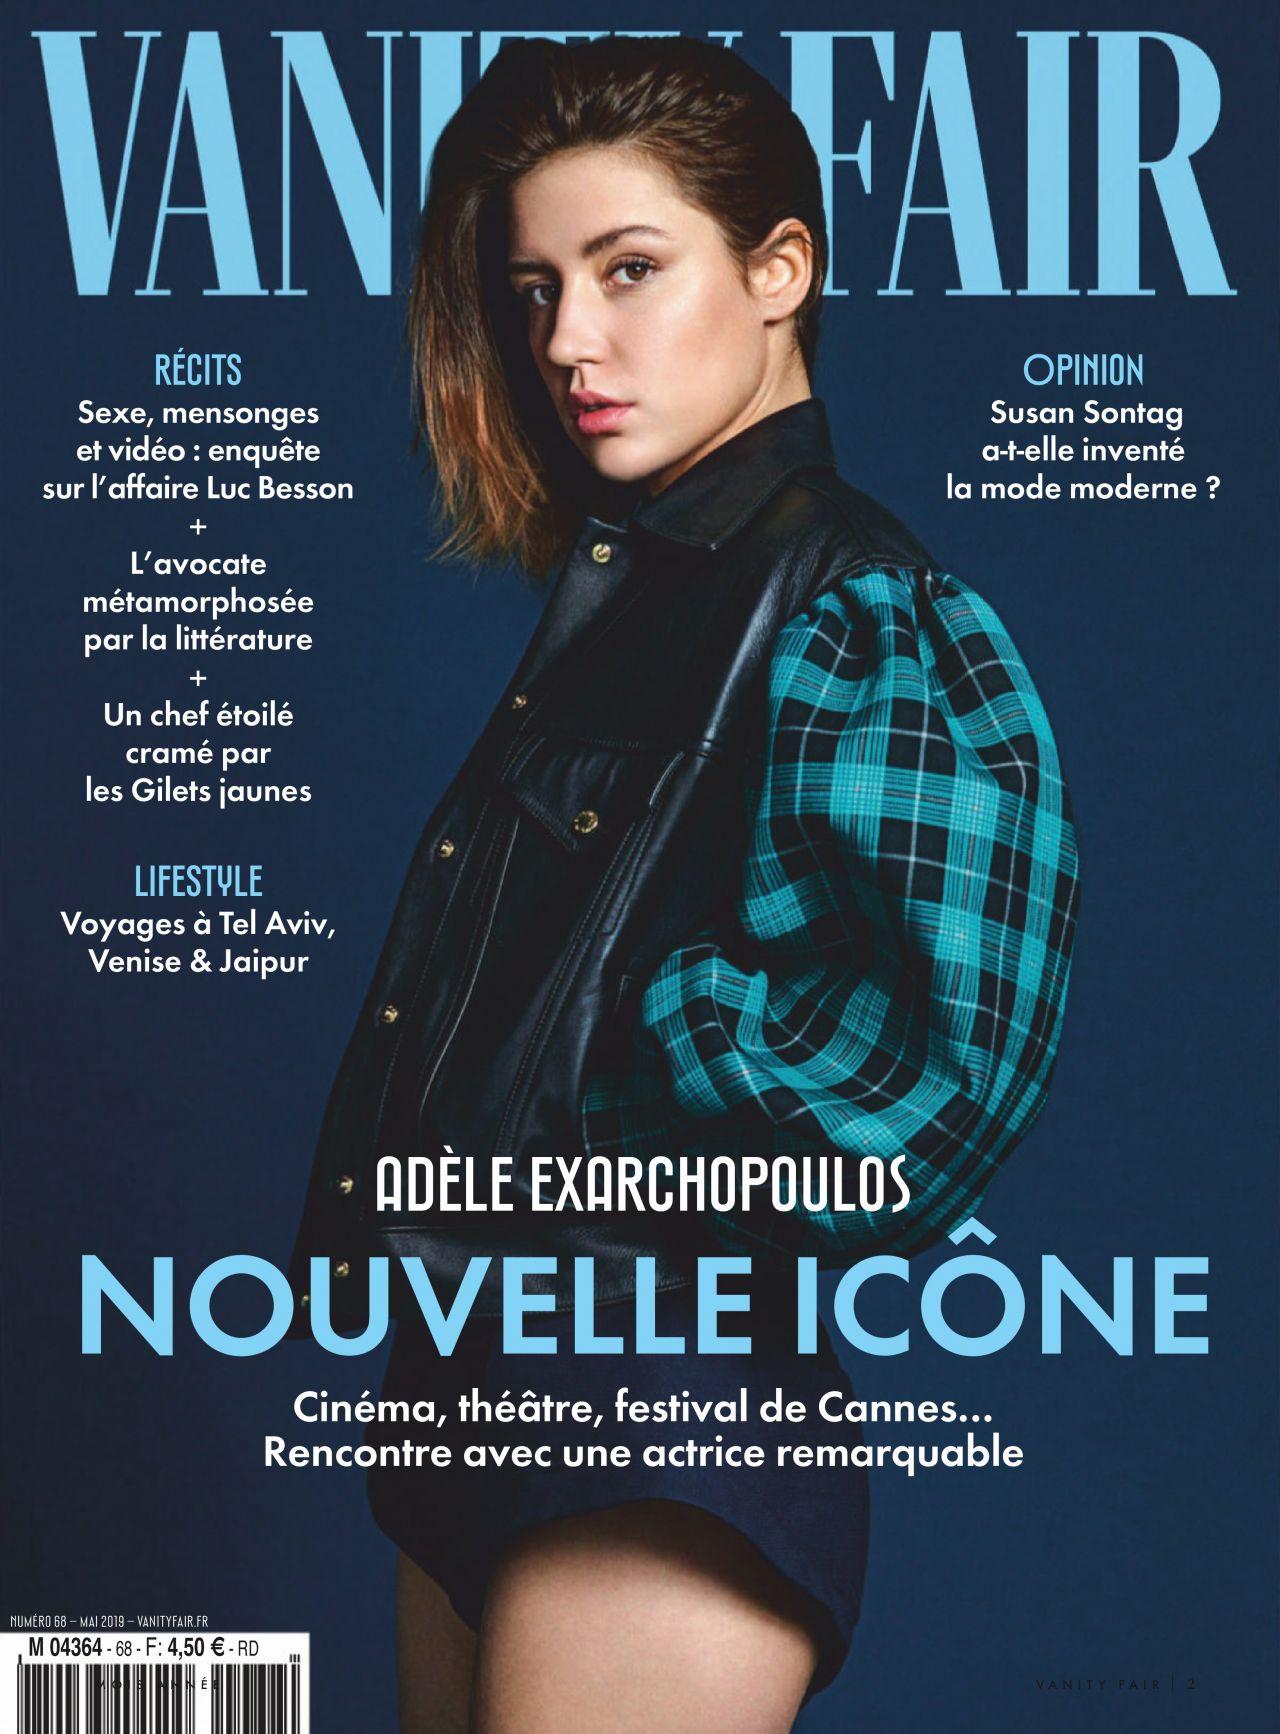 SHAILENE WOODLEY in Vanity Fair Magazine, July 2014 Issue